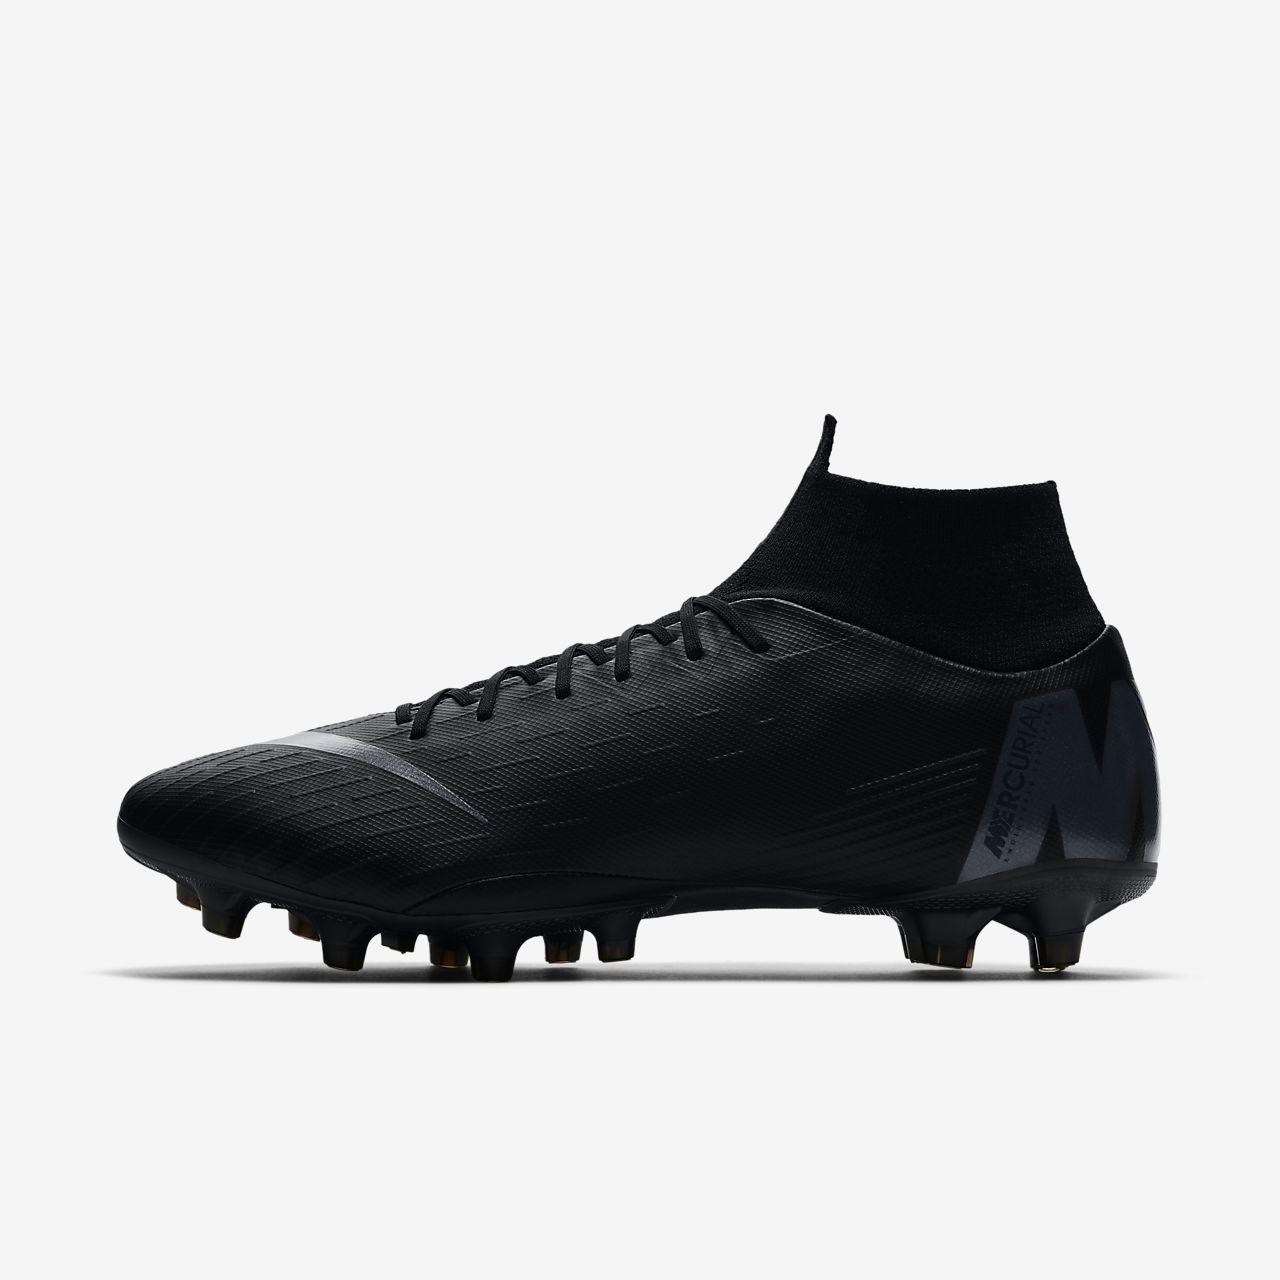 2581c3575d4d9 best calzado de fútbol para pasto artificial nike mercurial superfly vi pro  ag pro ebdc7 0fded